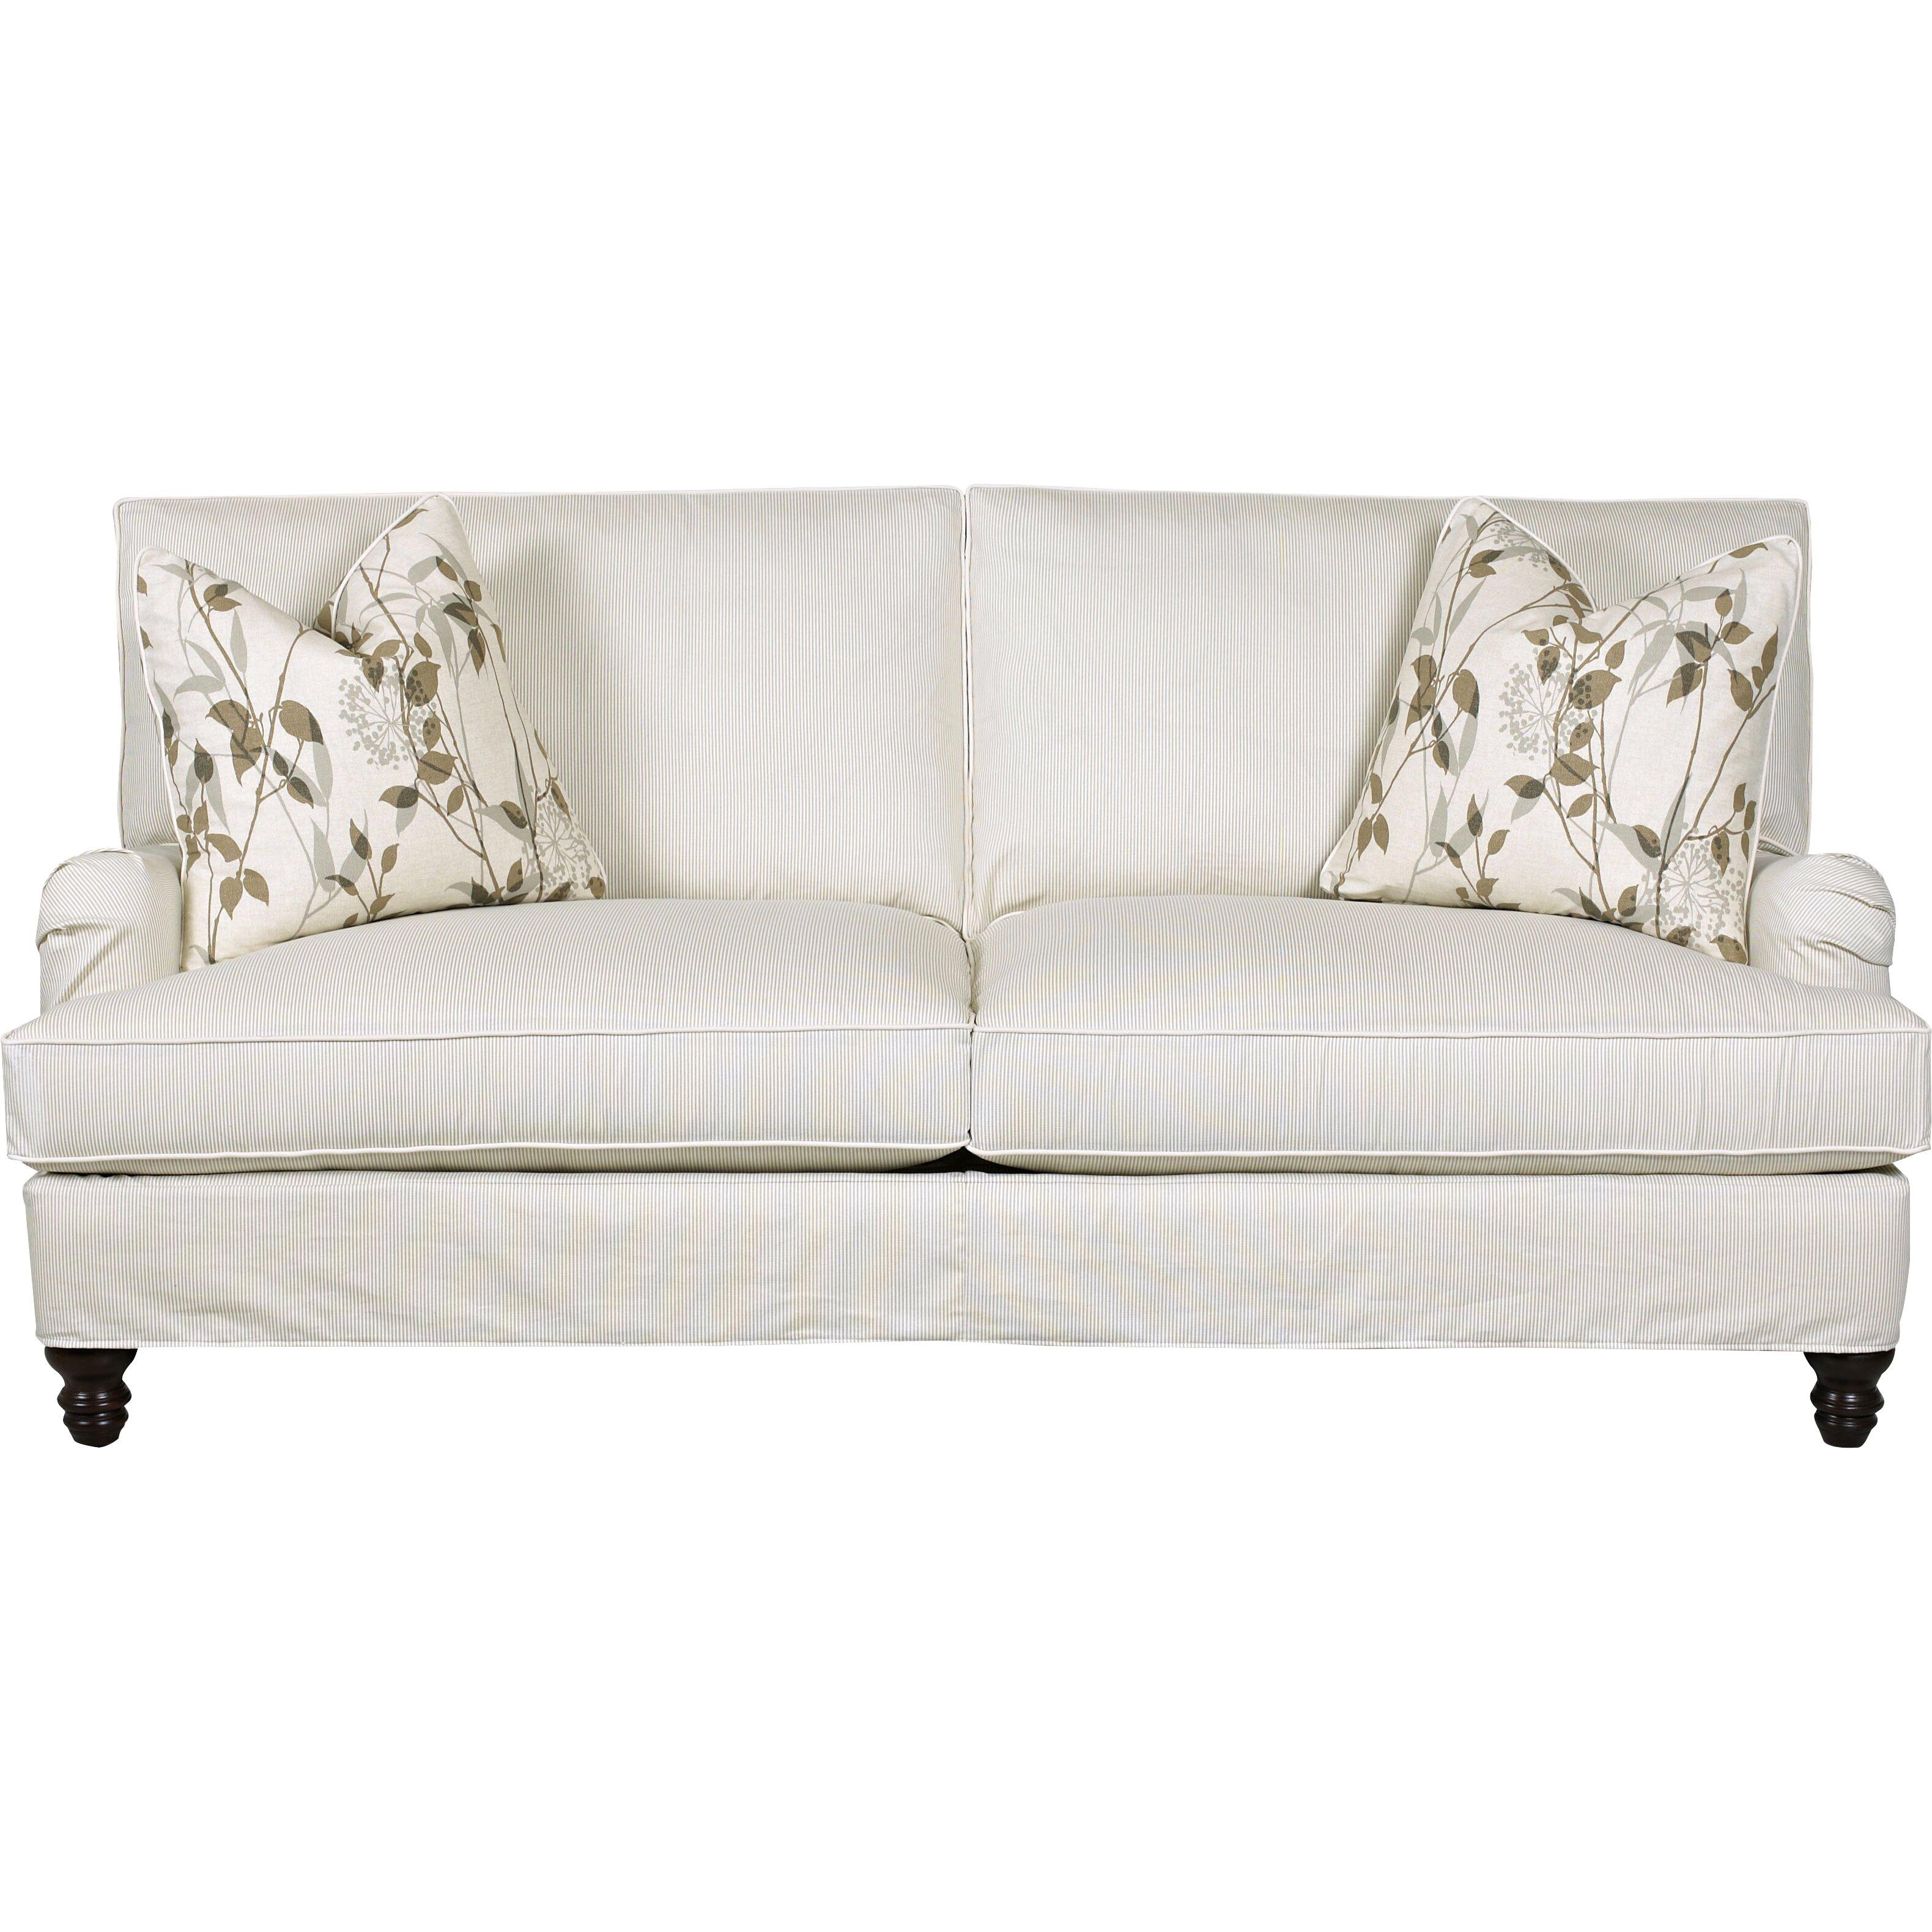 Klaussner furniture rory sofa reviews wayfair for Klaus k living room brunssi